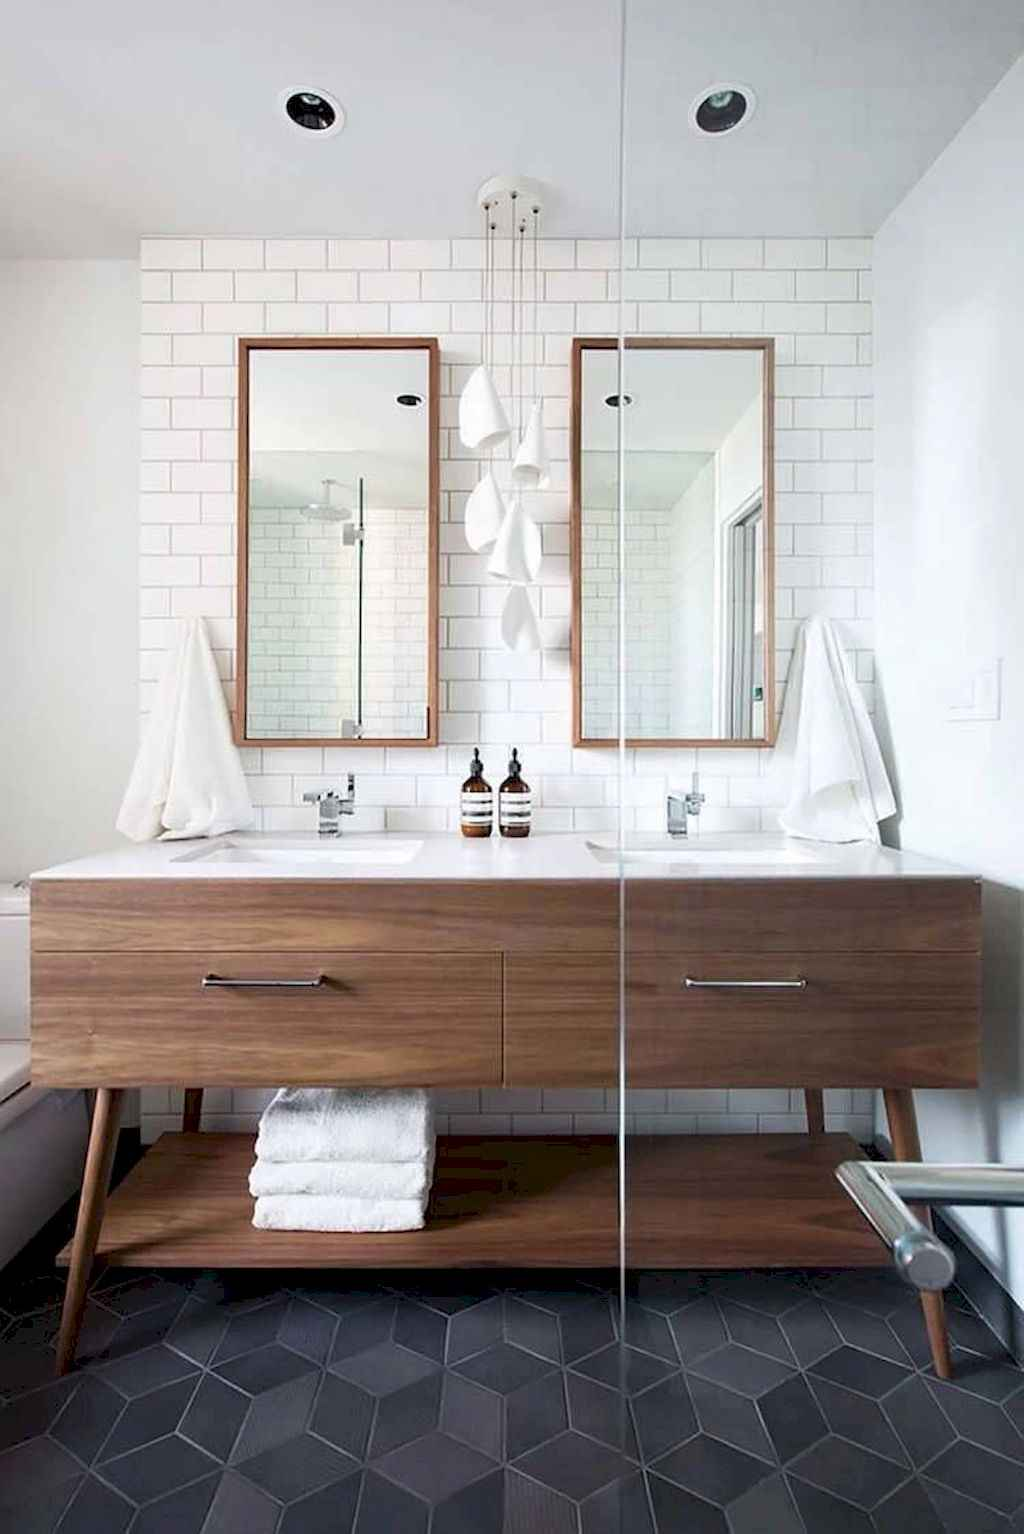 111 Brilliant Small Bathroom Remodel Ideas On A Budget (93)